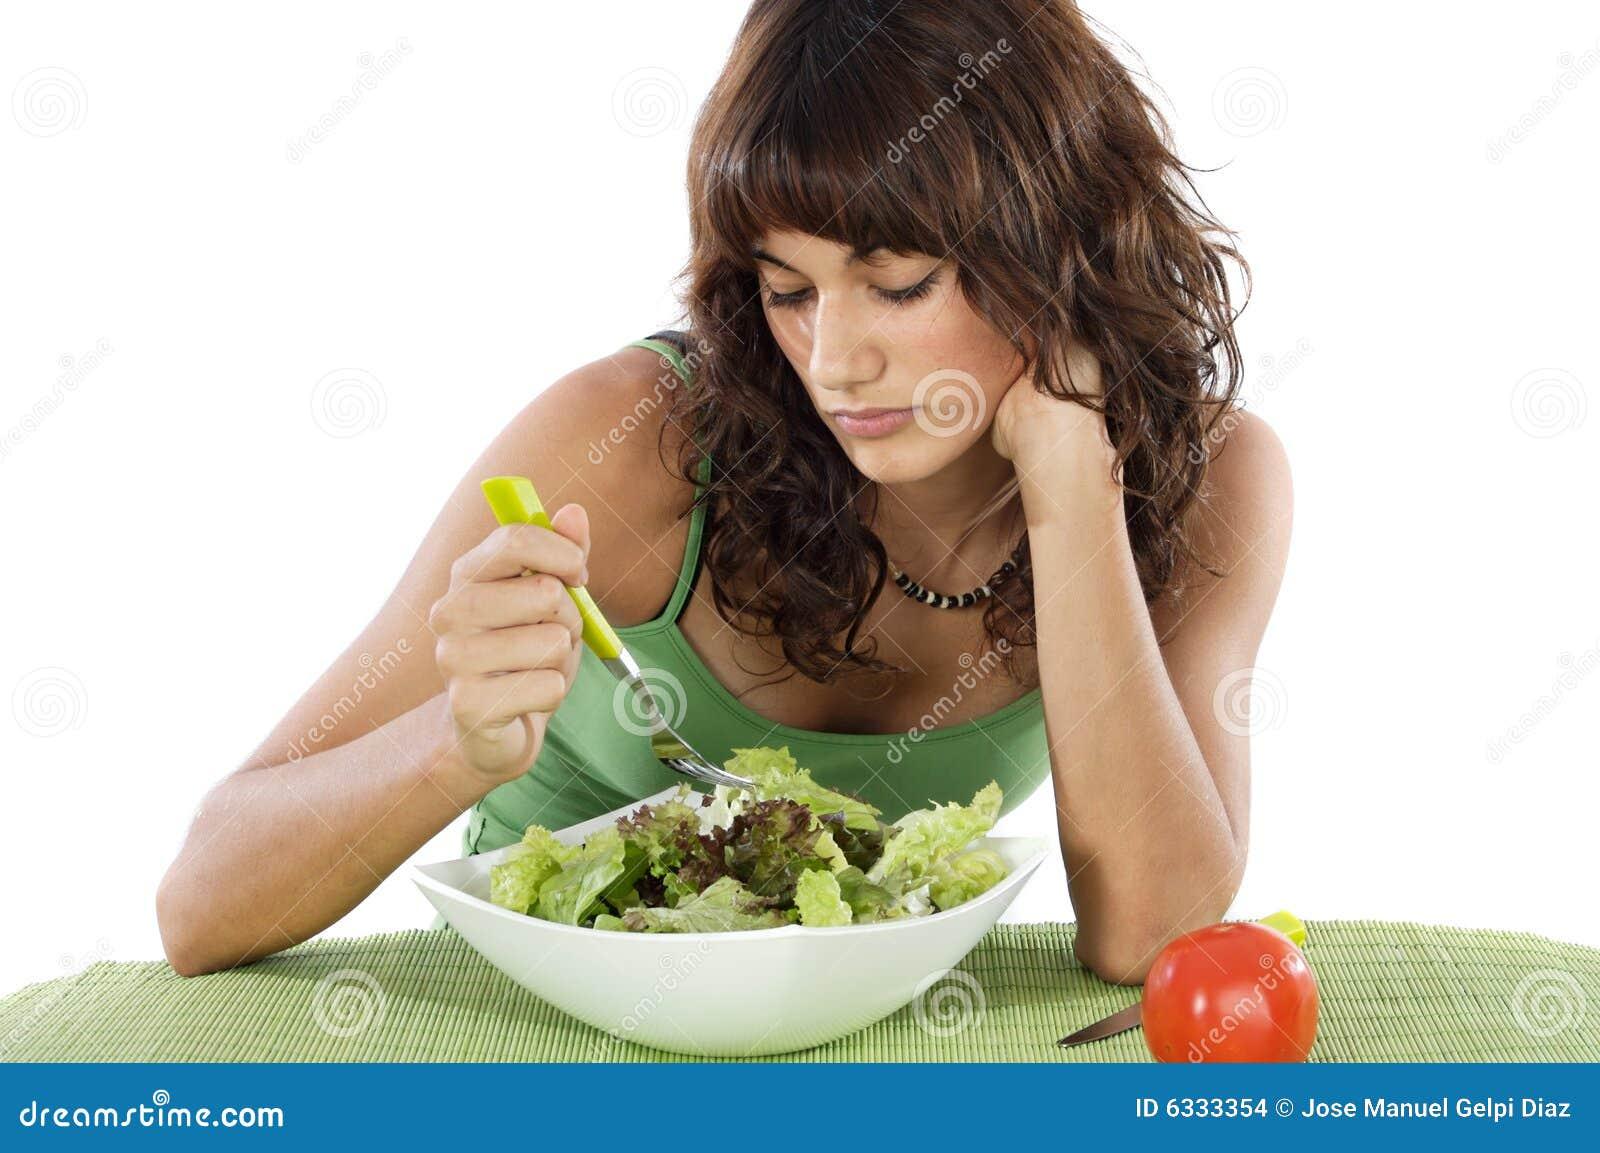 A Sad Teen Eating Salad Stock Images - Image: 6333354